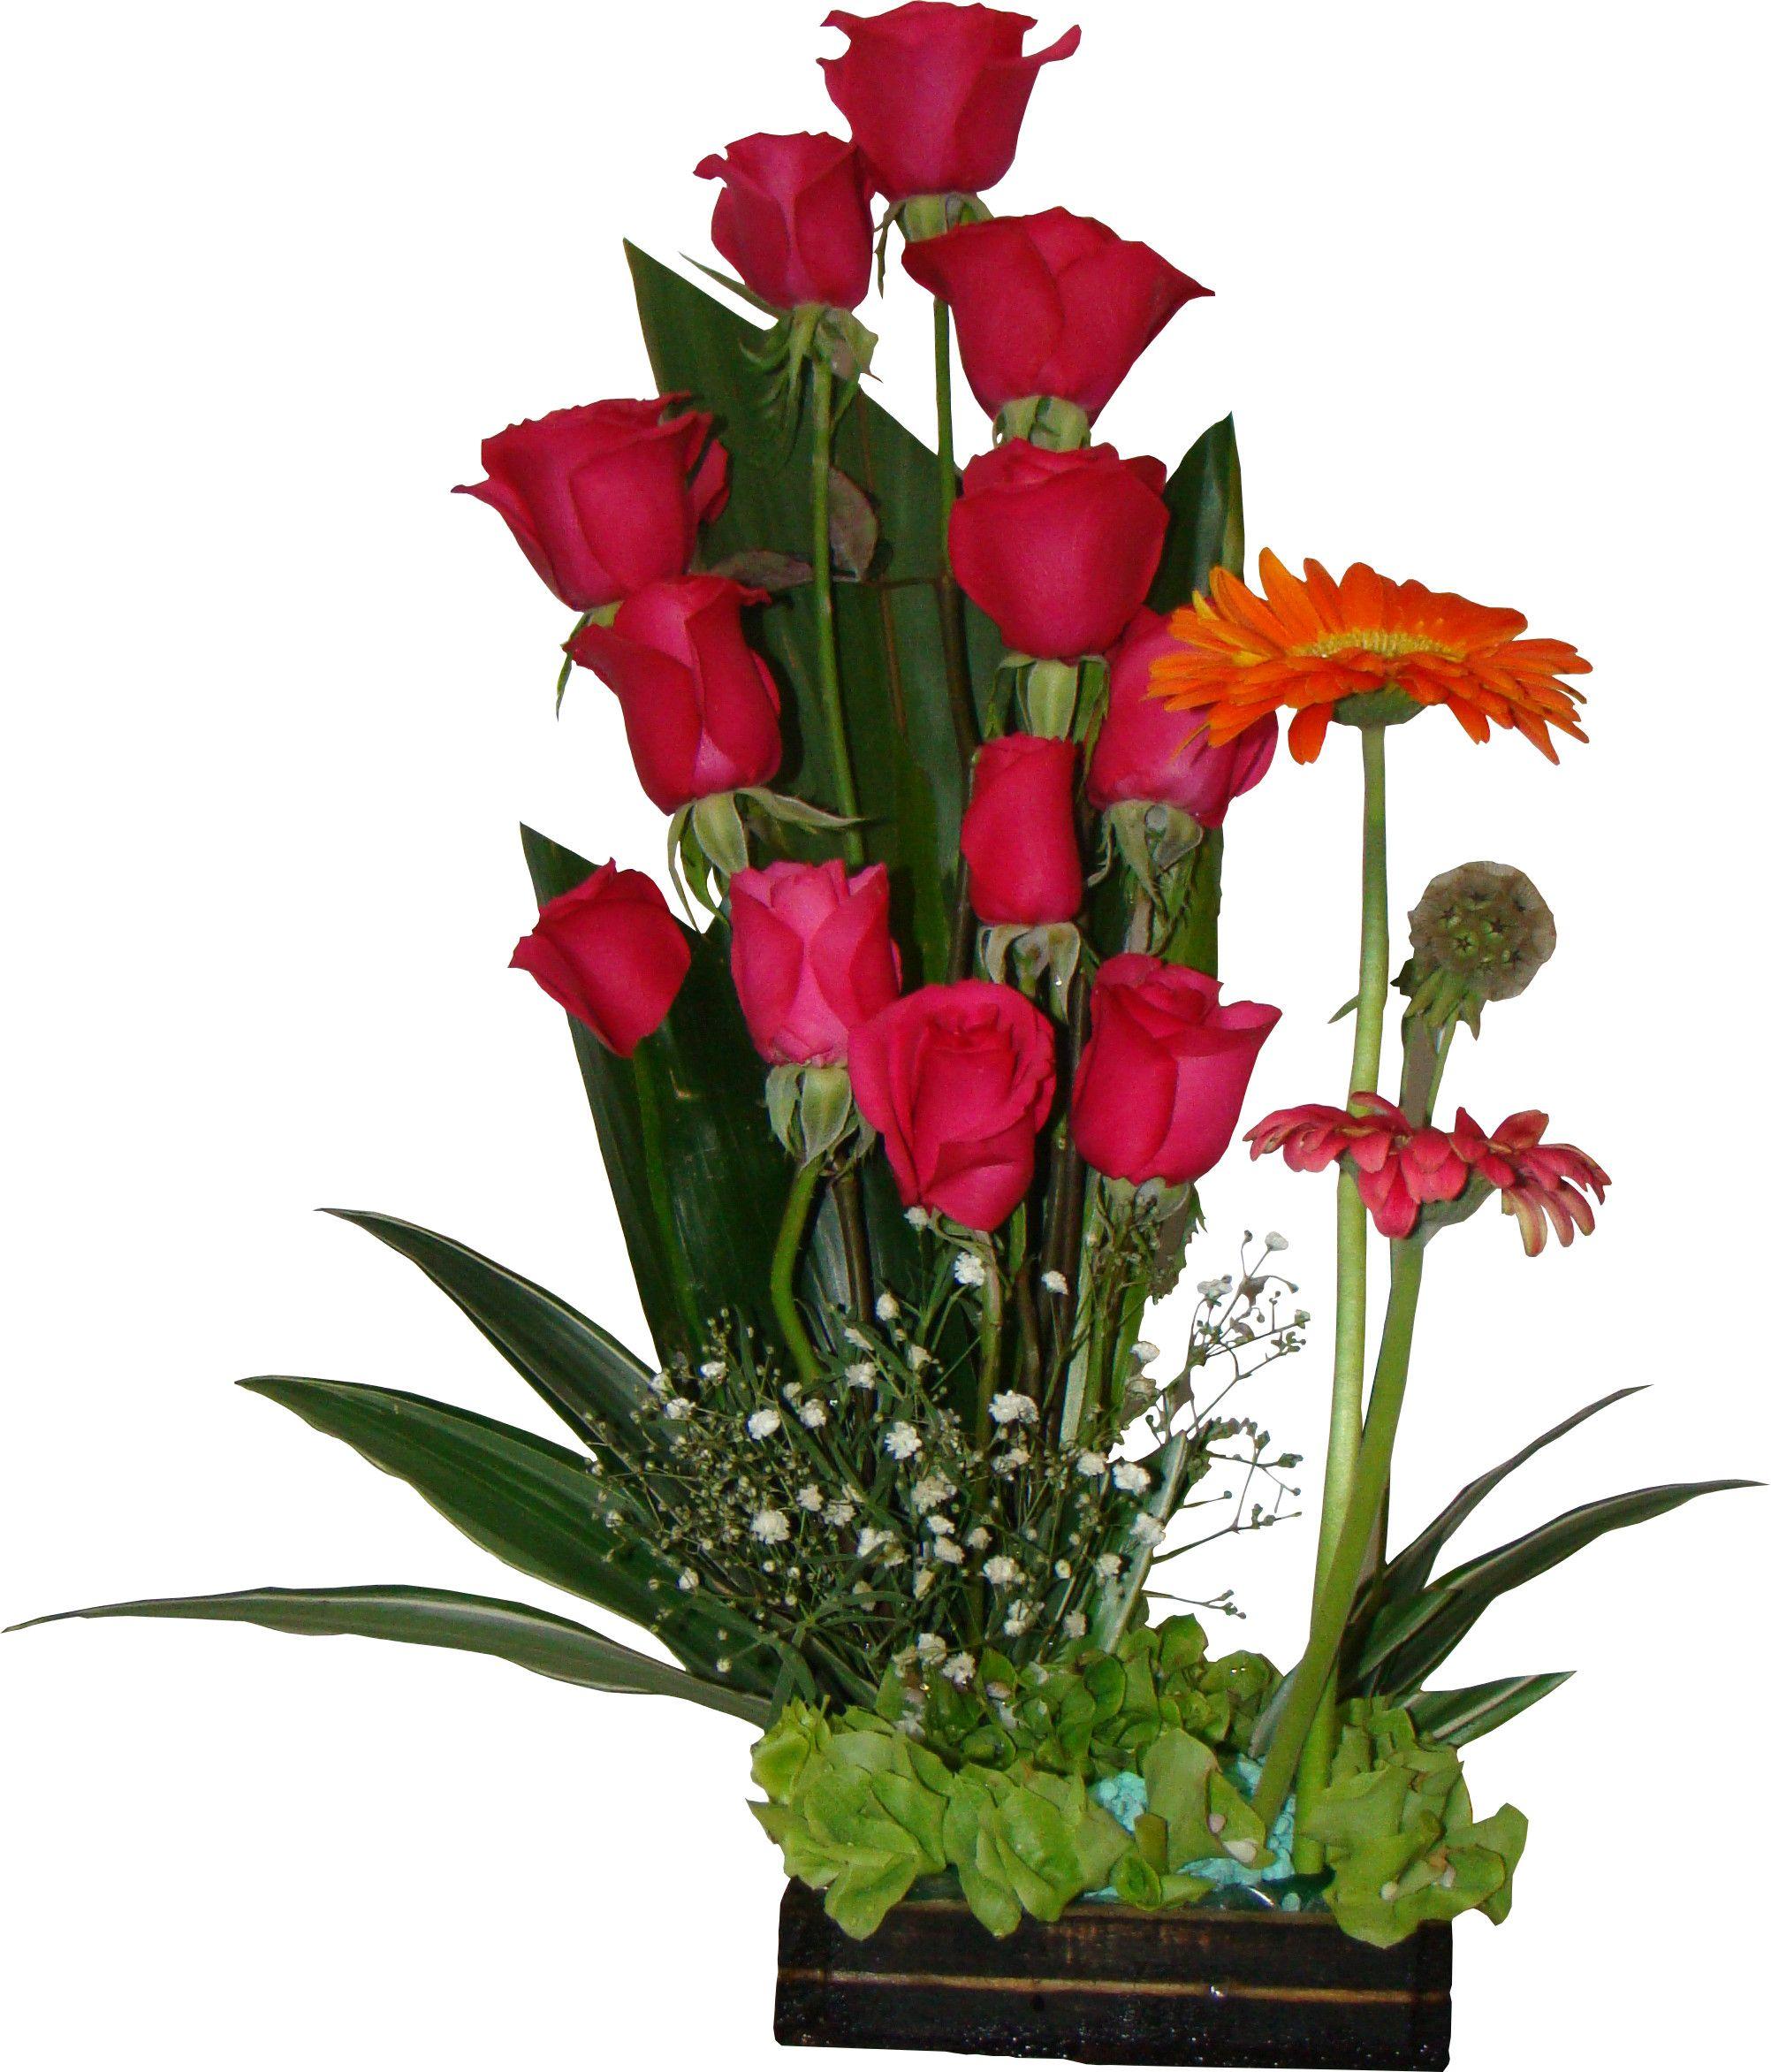 Pin De Ingrid Jauregui En Flores Arreglos Florales